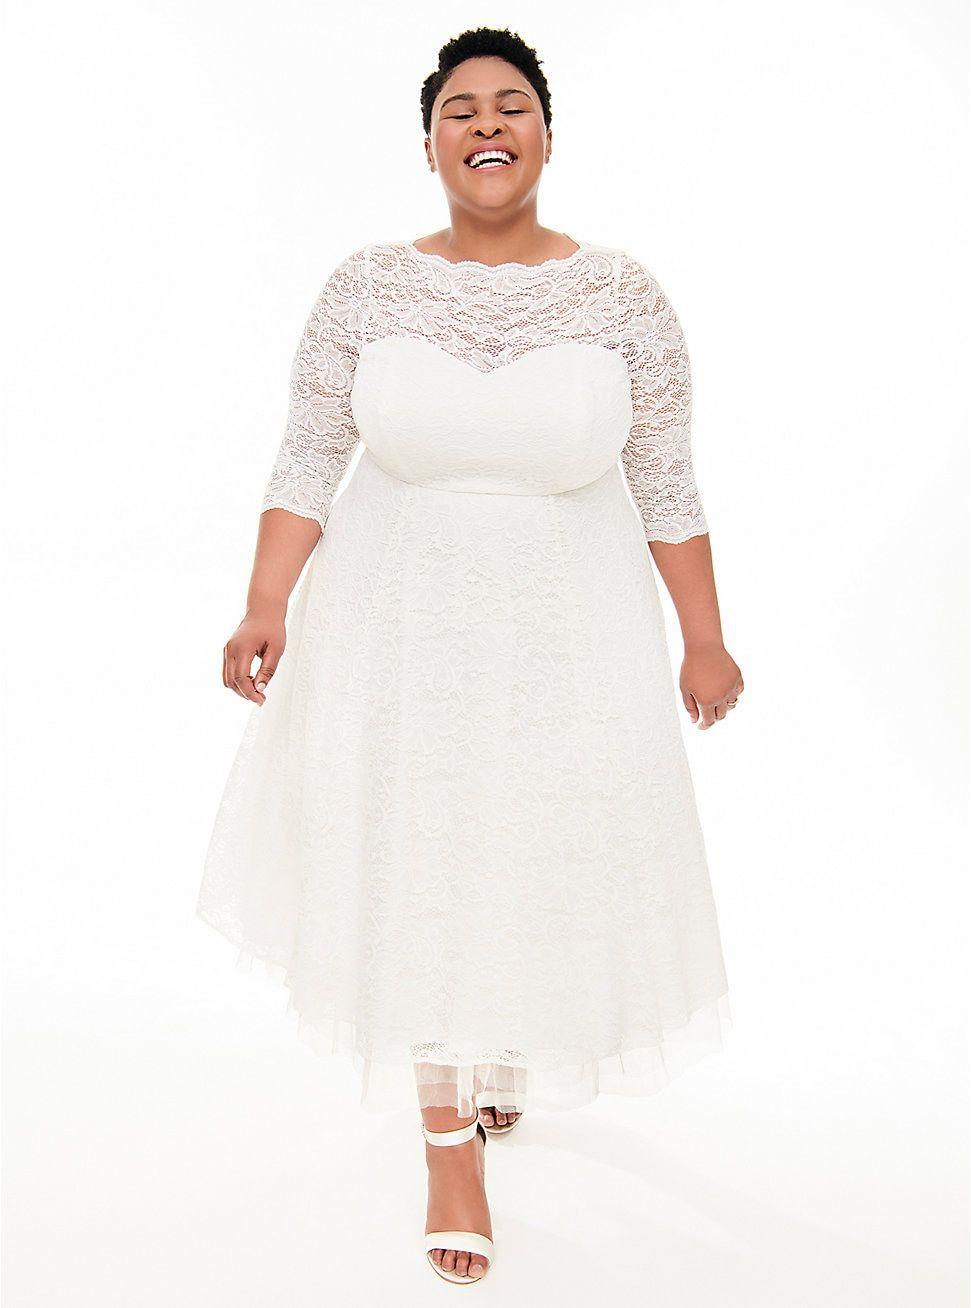 Ivory Lace Tea Length Wedding Dress White Lace Midi Dress Plus Size Brides Plus Size Wedding Gowns